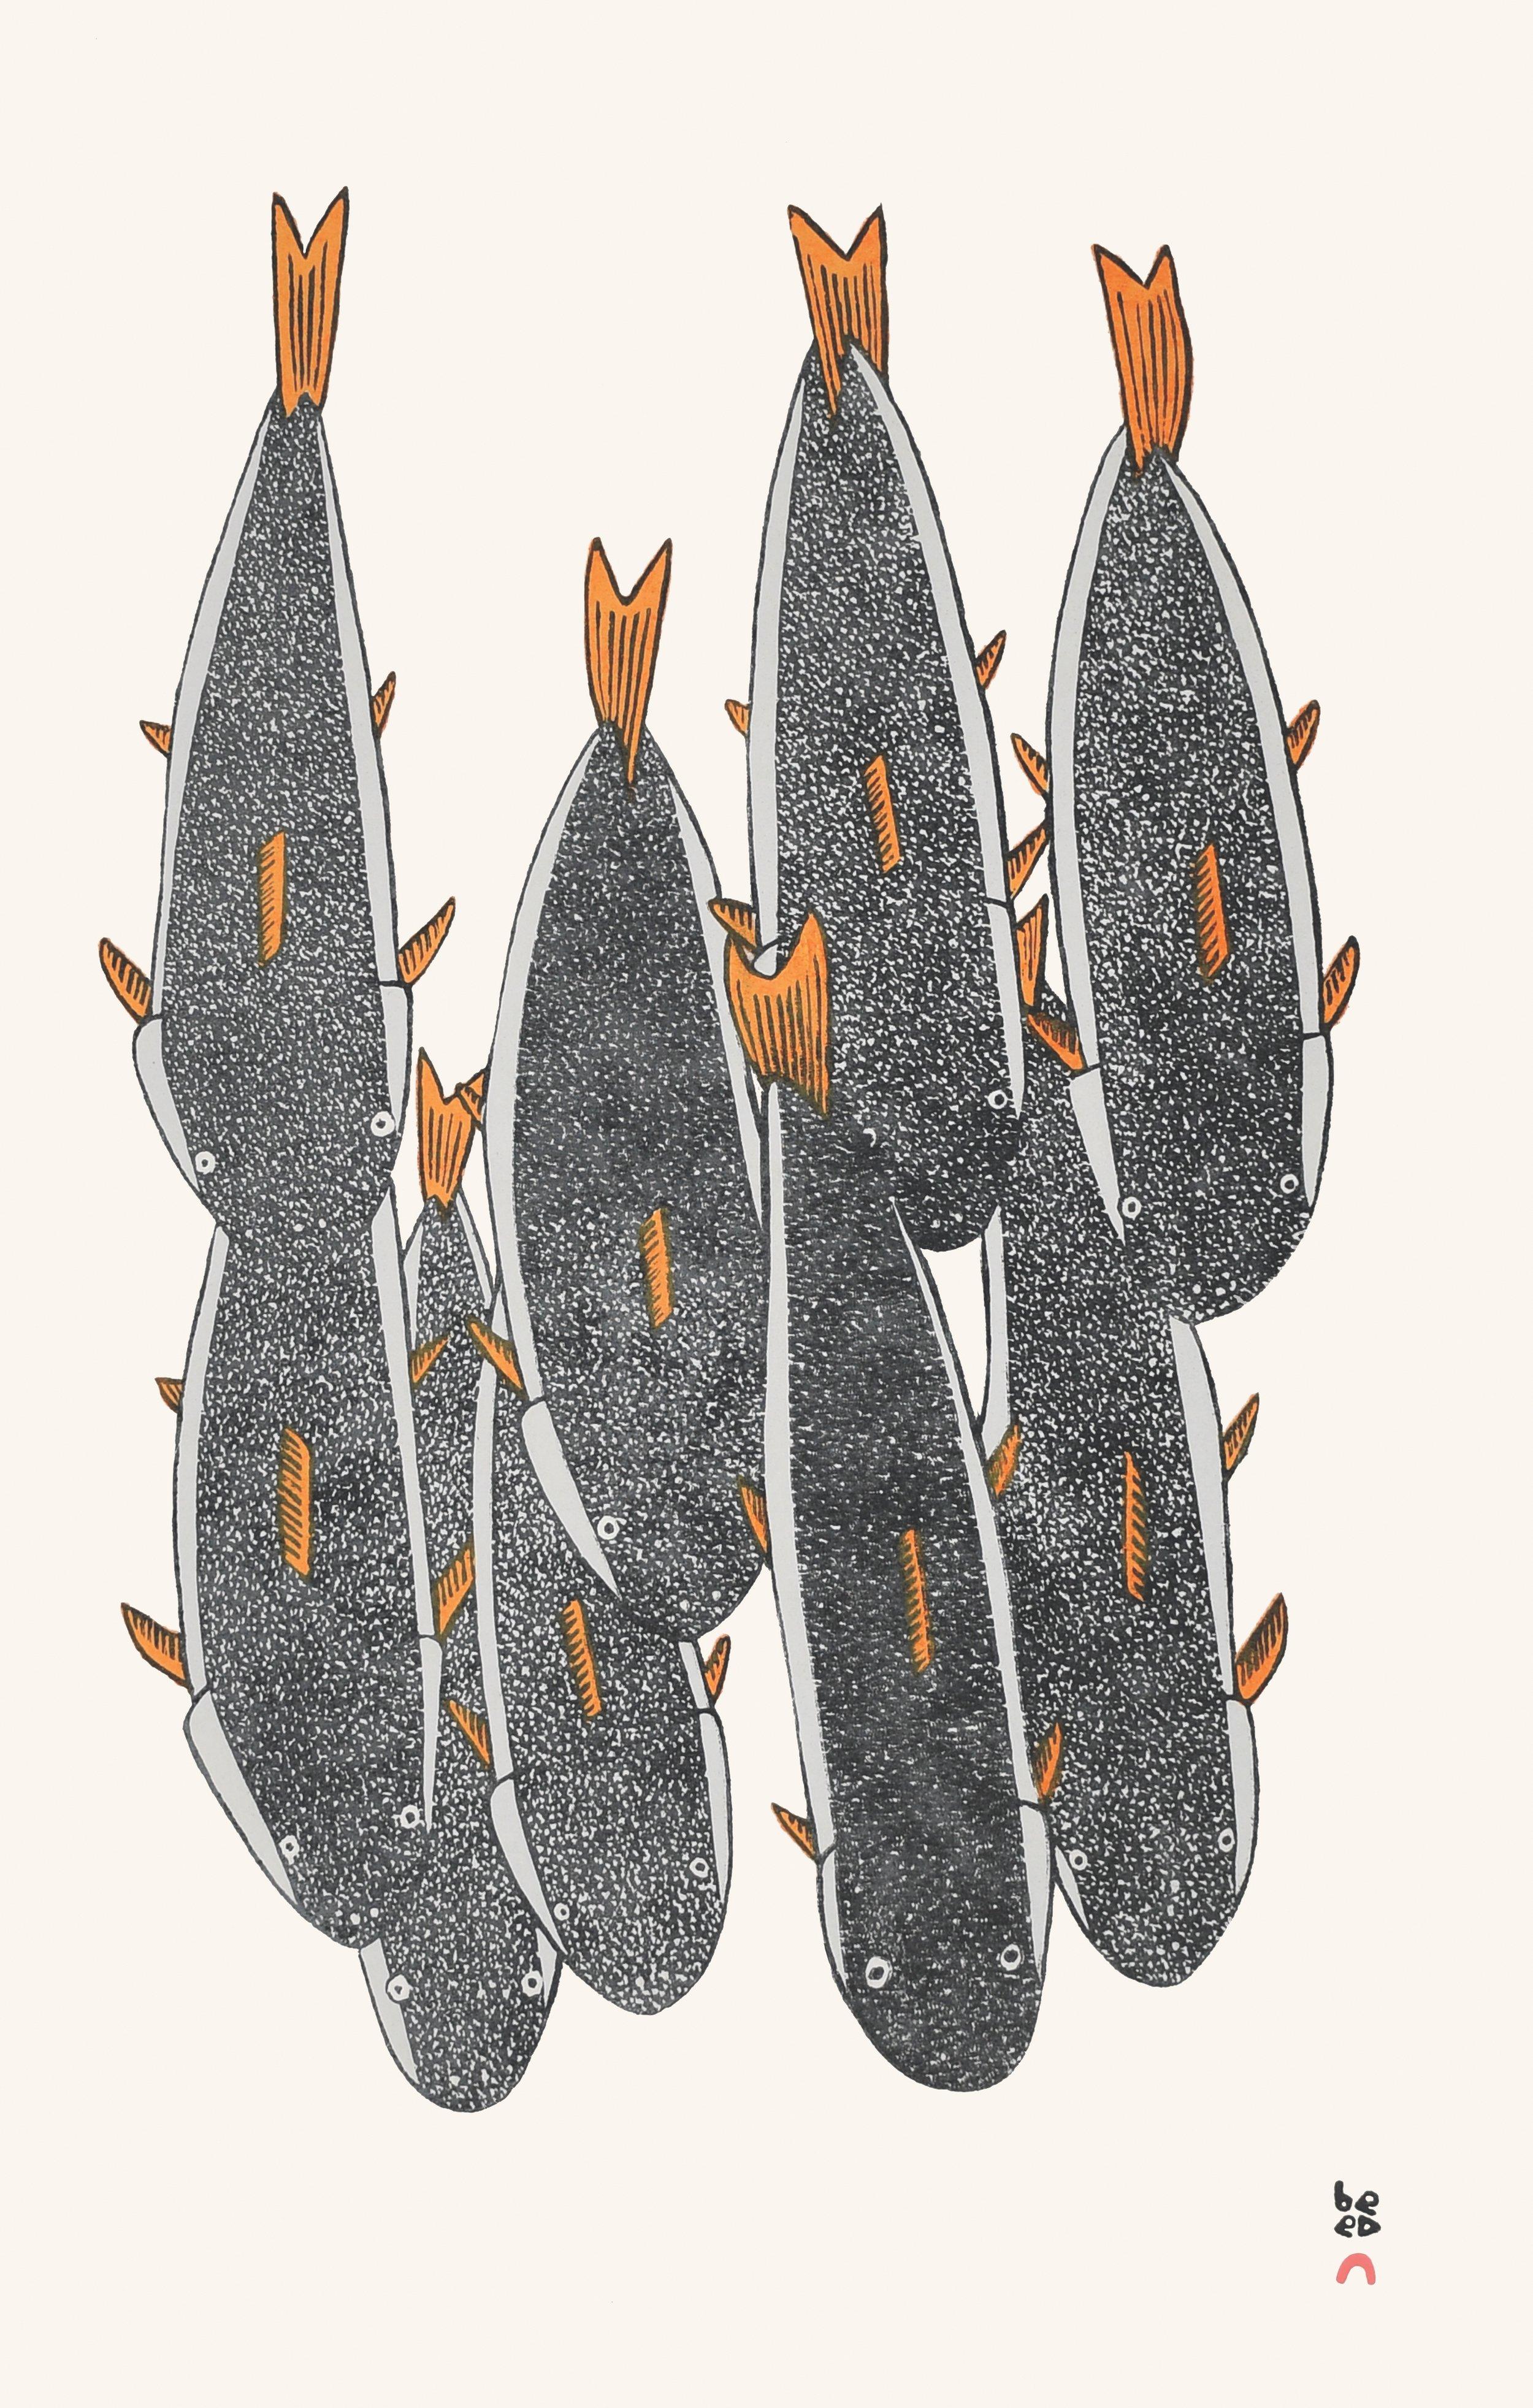 MOSESEE MANGITAK  17. School of Char  Stonecut  Paper: Kizuki Kozo Natural  Printer: Qavavau Manumie  59.7 x 38 cm  $ 500